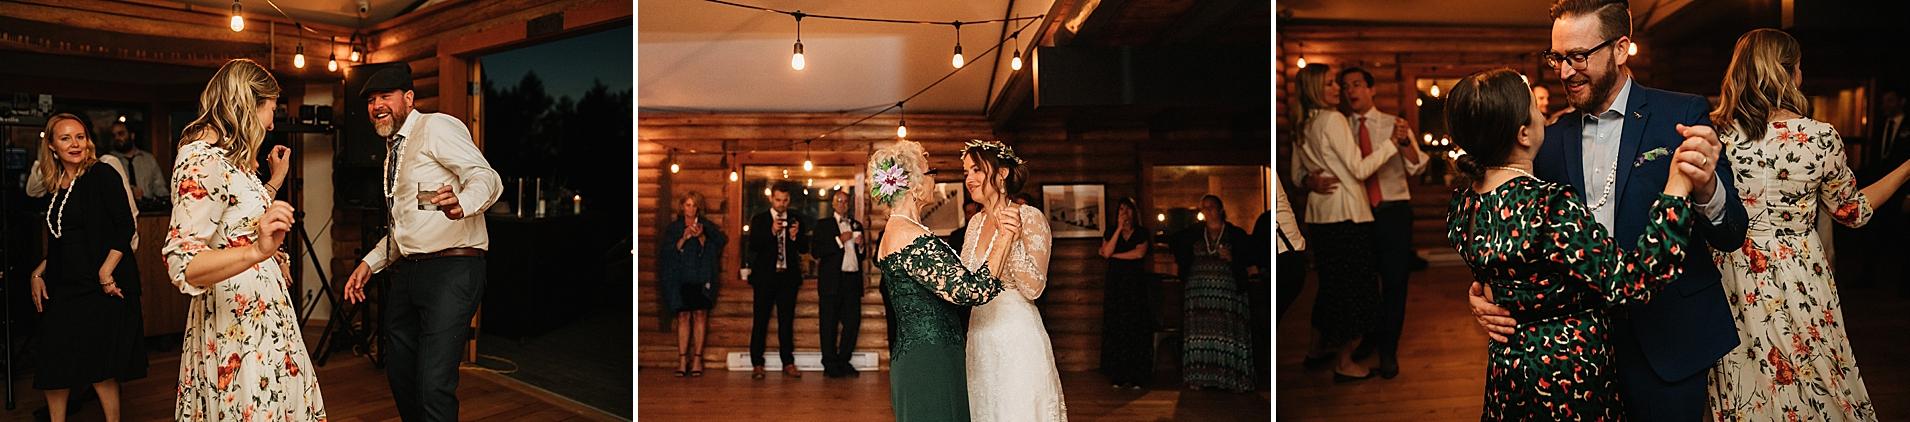 bodega ridge wedding dancing.jpg